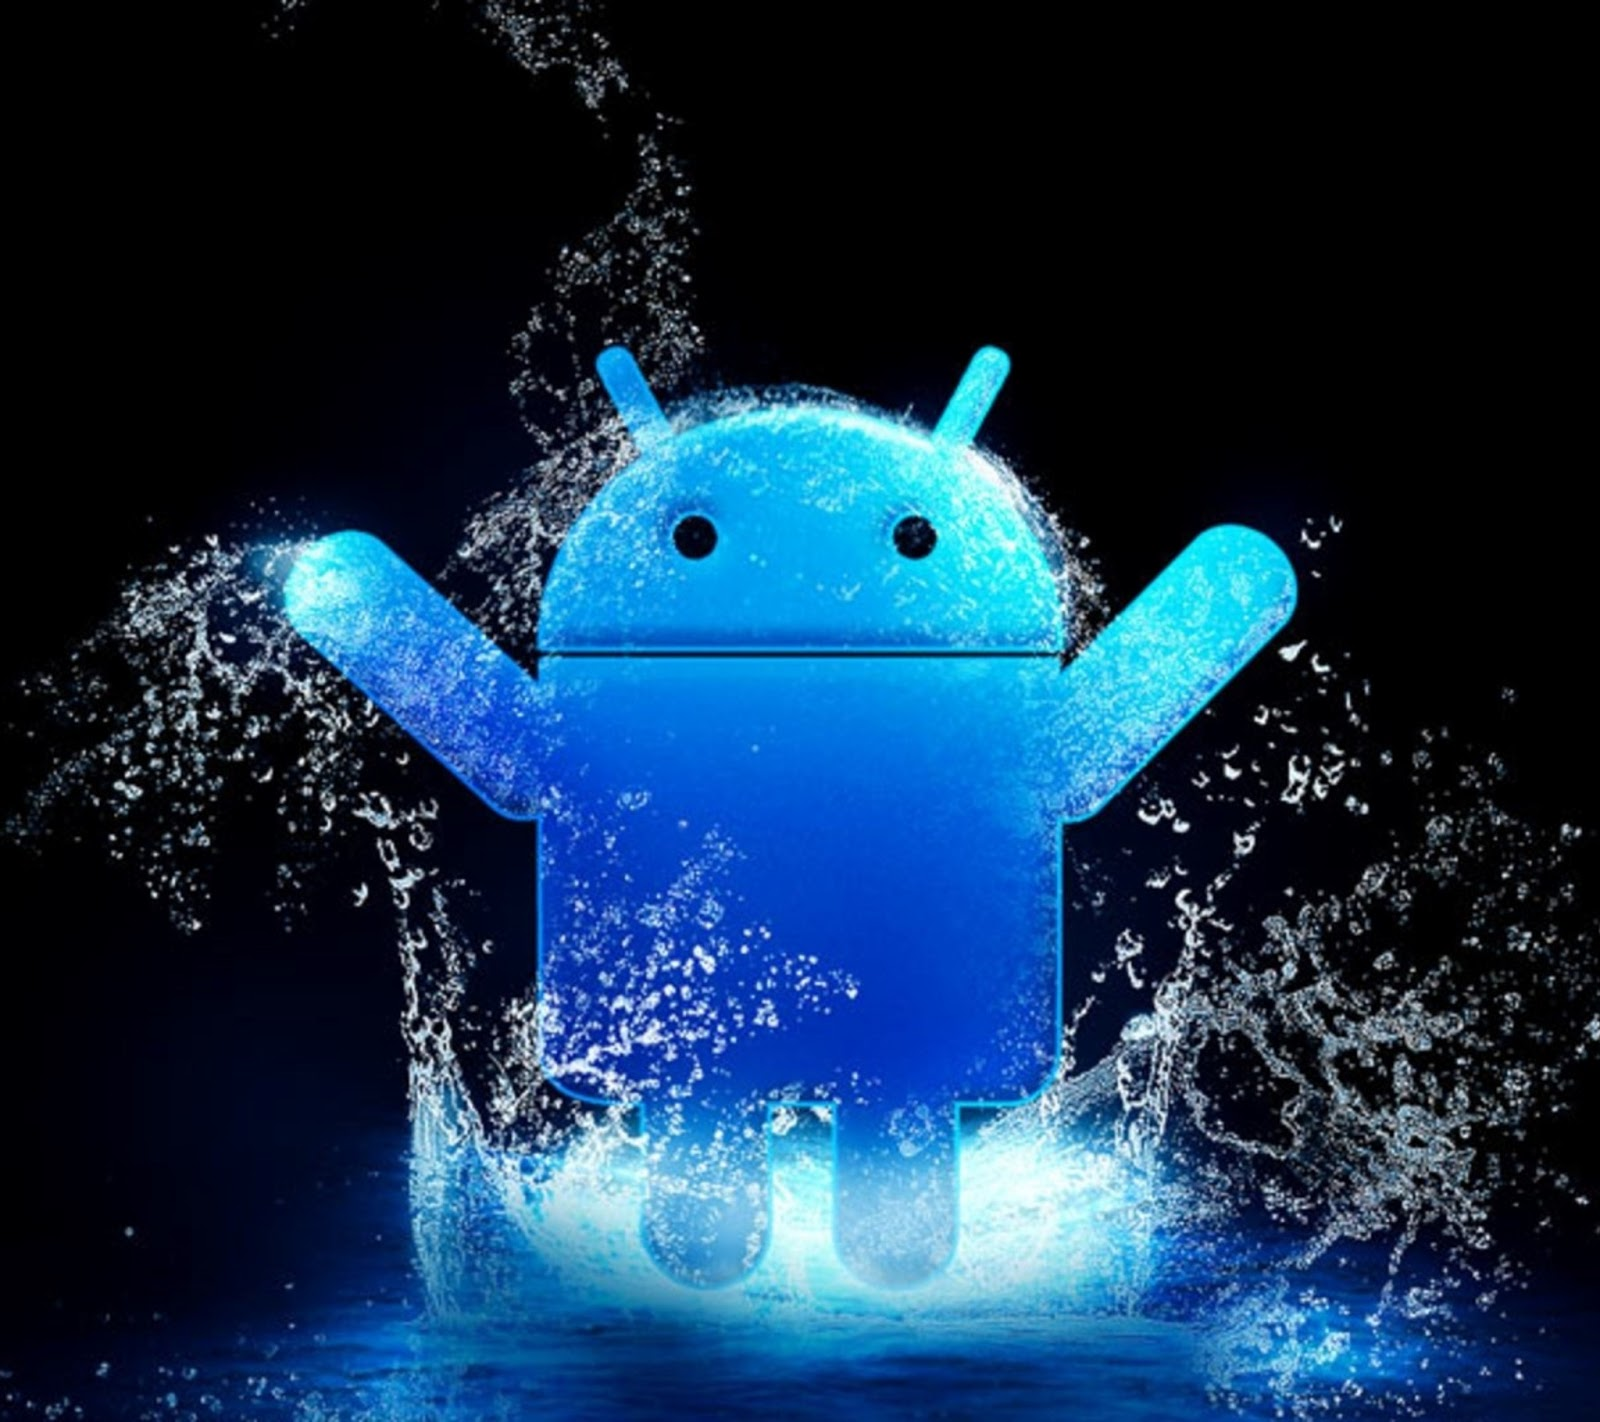 Galaxy Wallpaper 1080p: Samsung HD Wallpapers 1080p